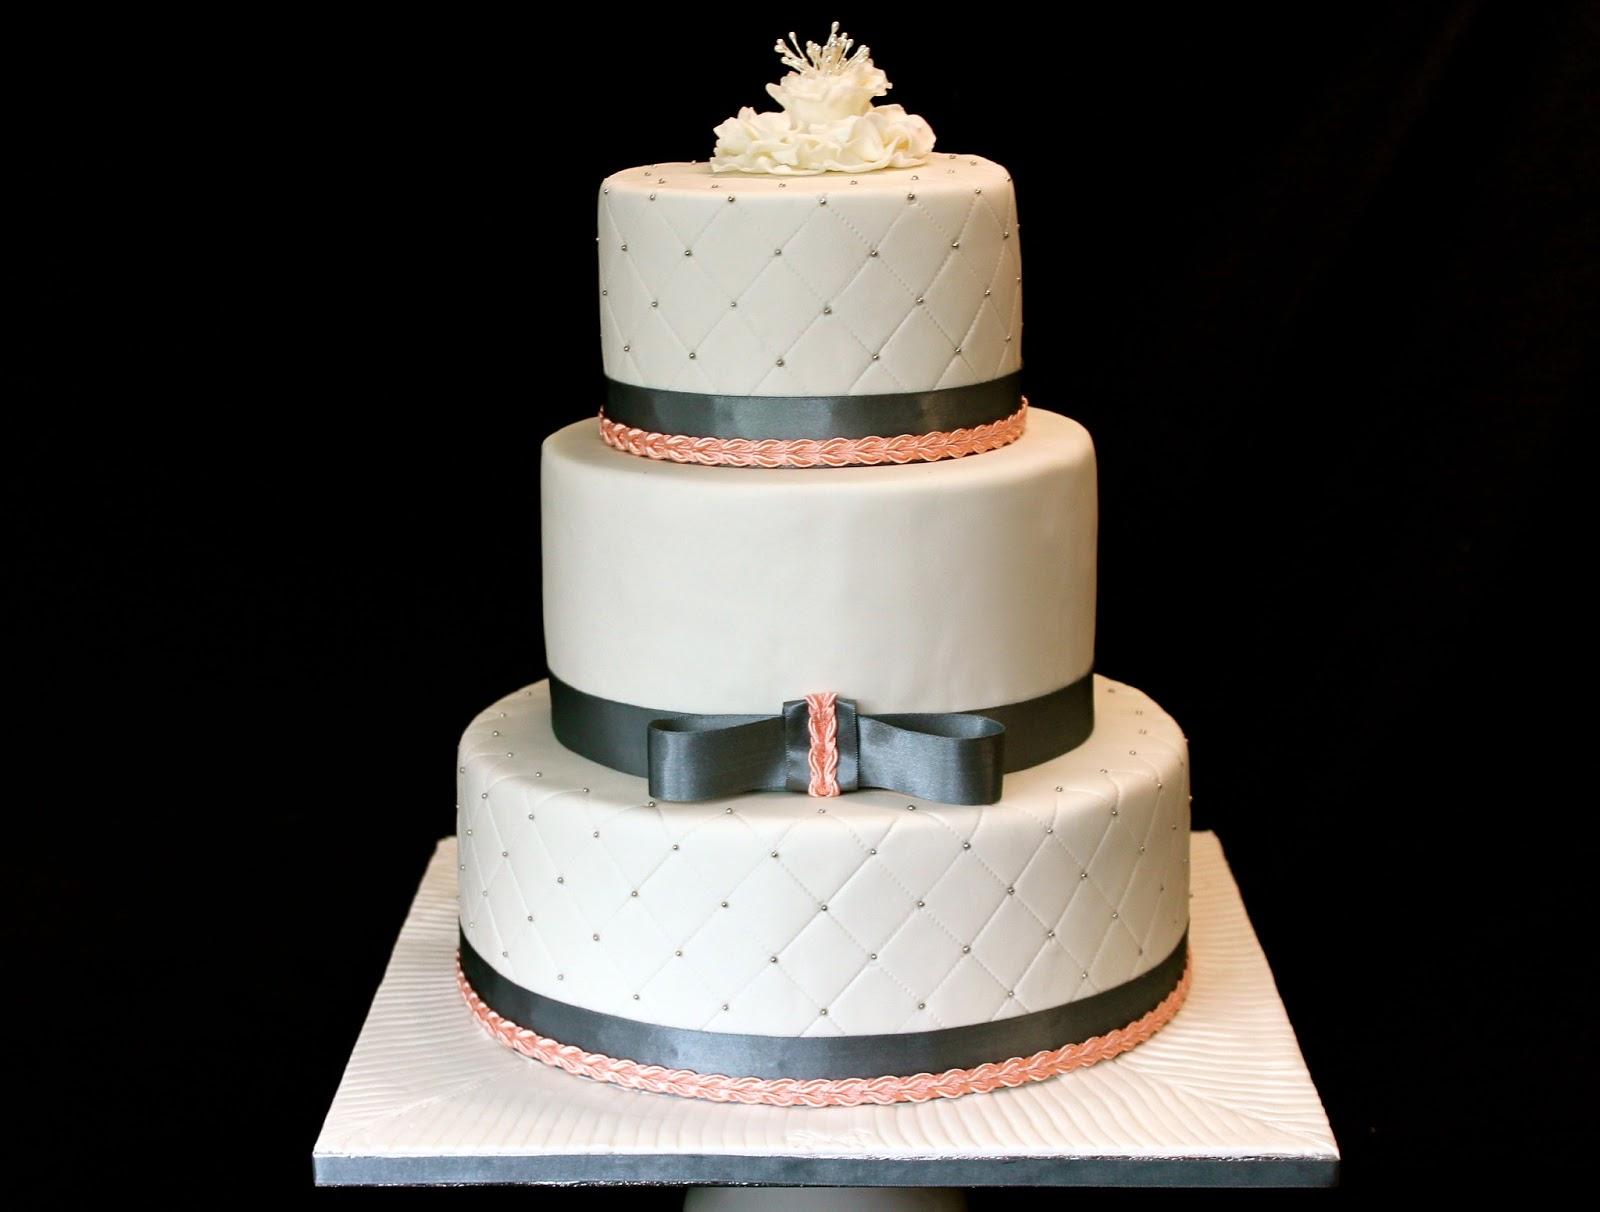 Pretty wedding: Wedding cake : recette du gâteau de mariage